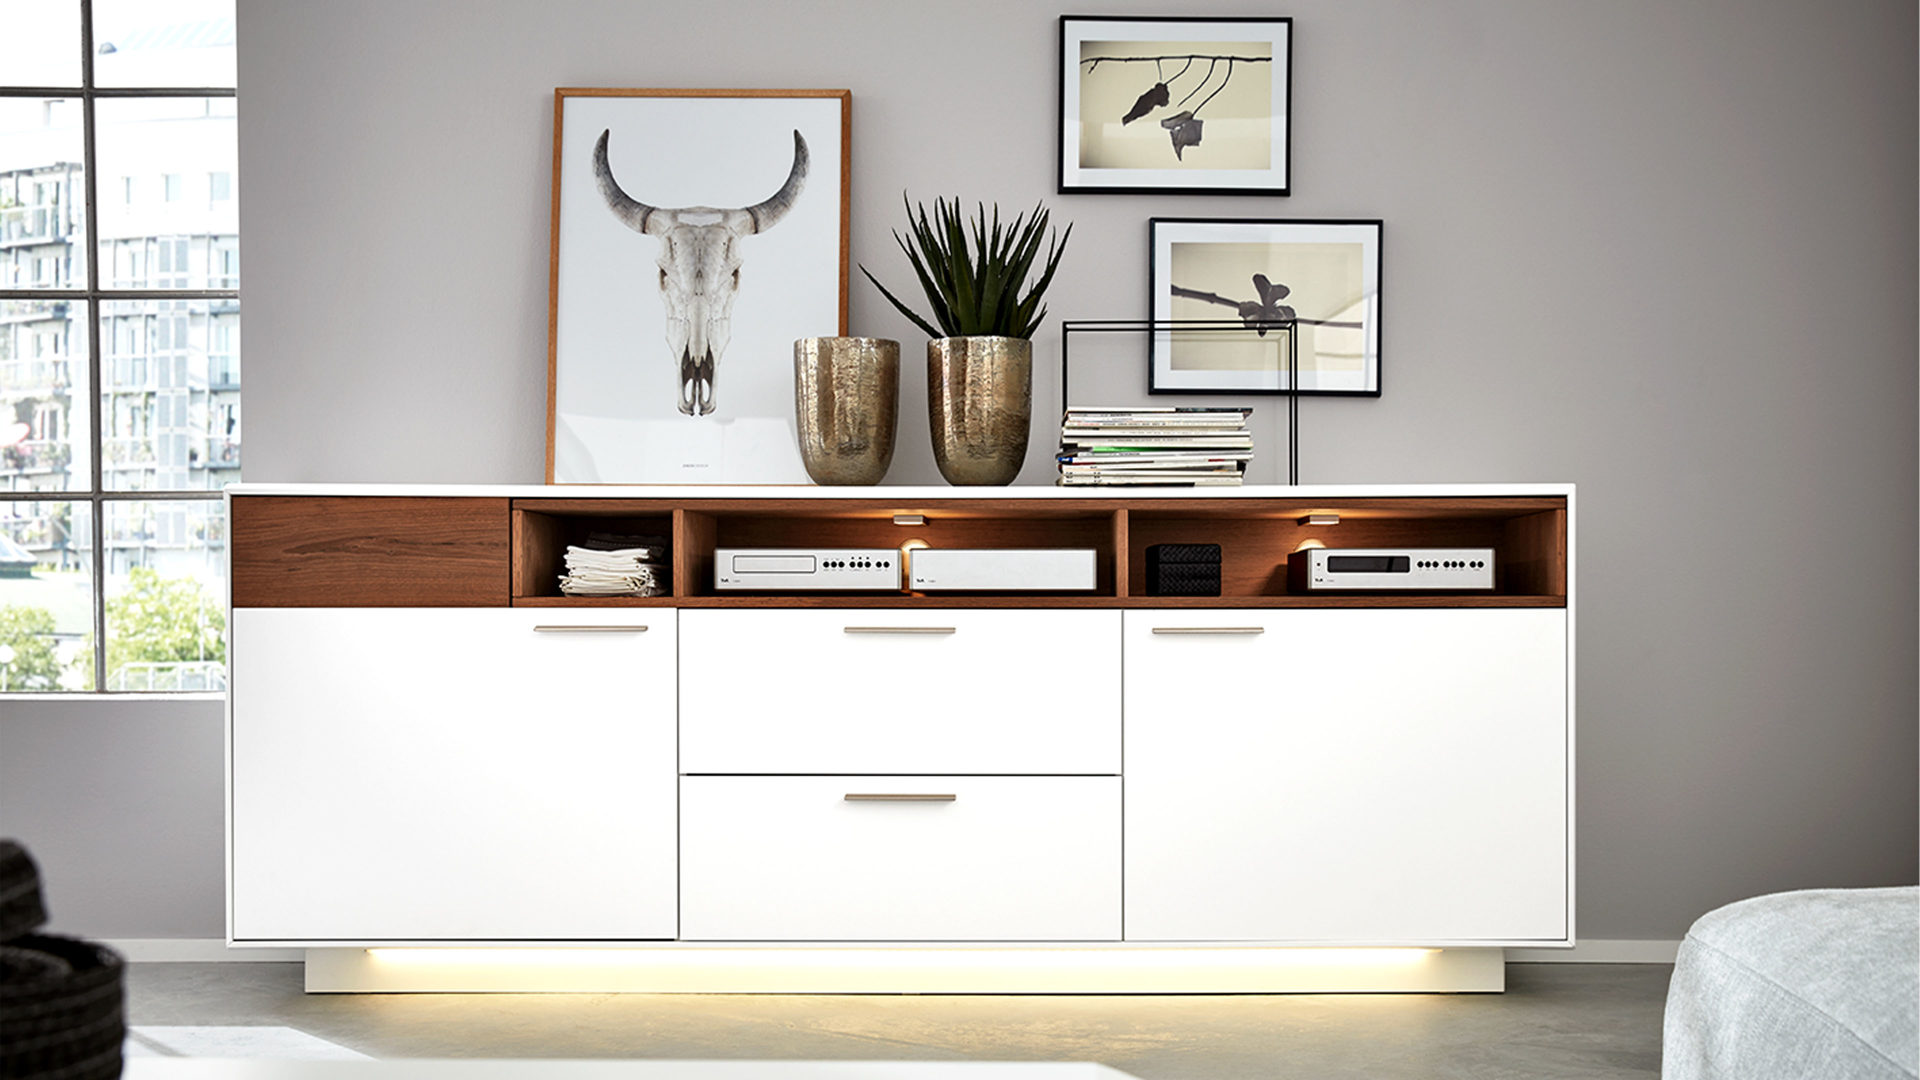 Interliving Wohnzimmer Serie 2102 – Sideboard 510266, dunkles,